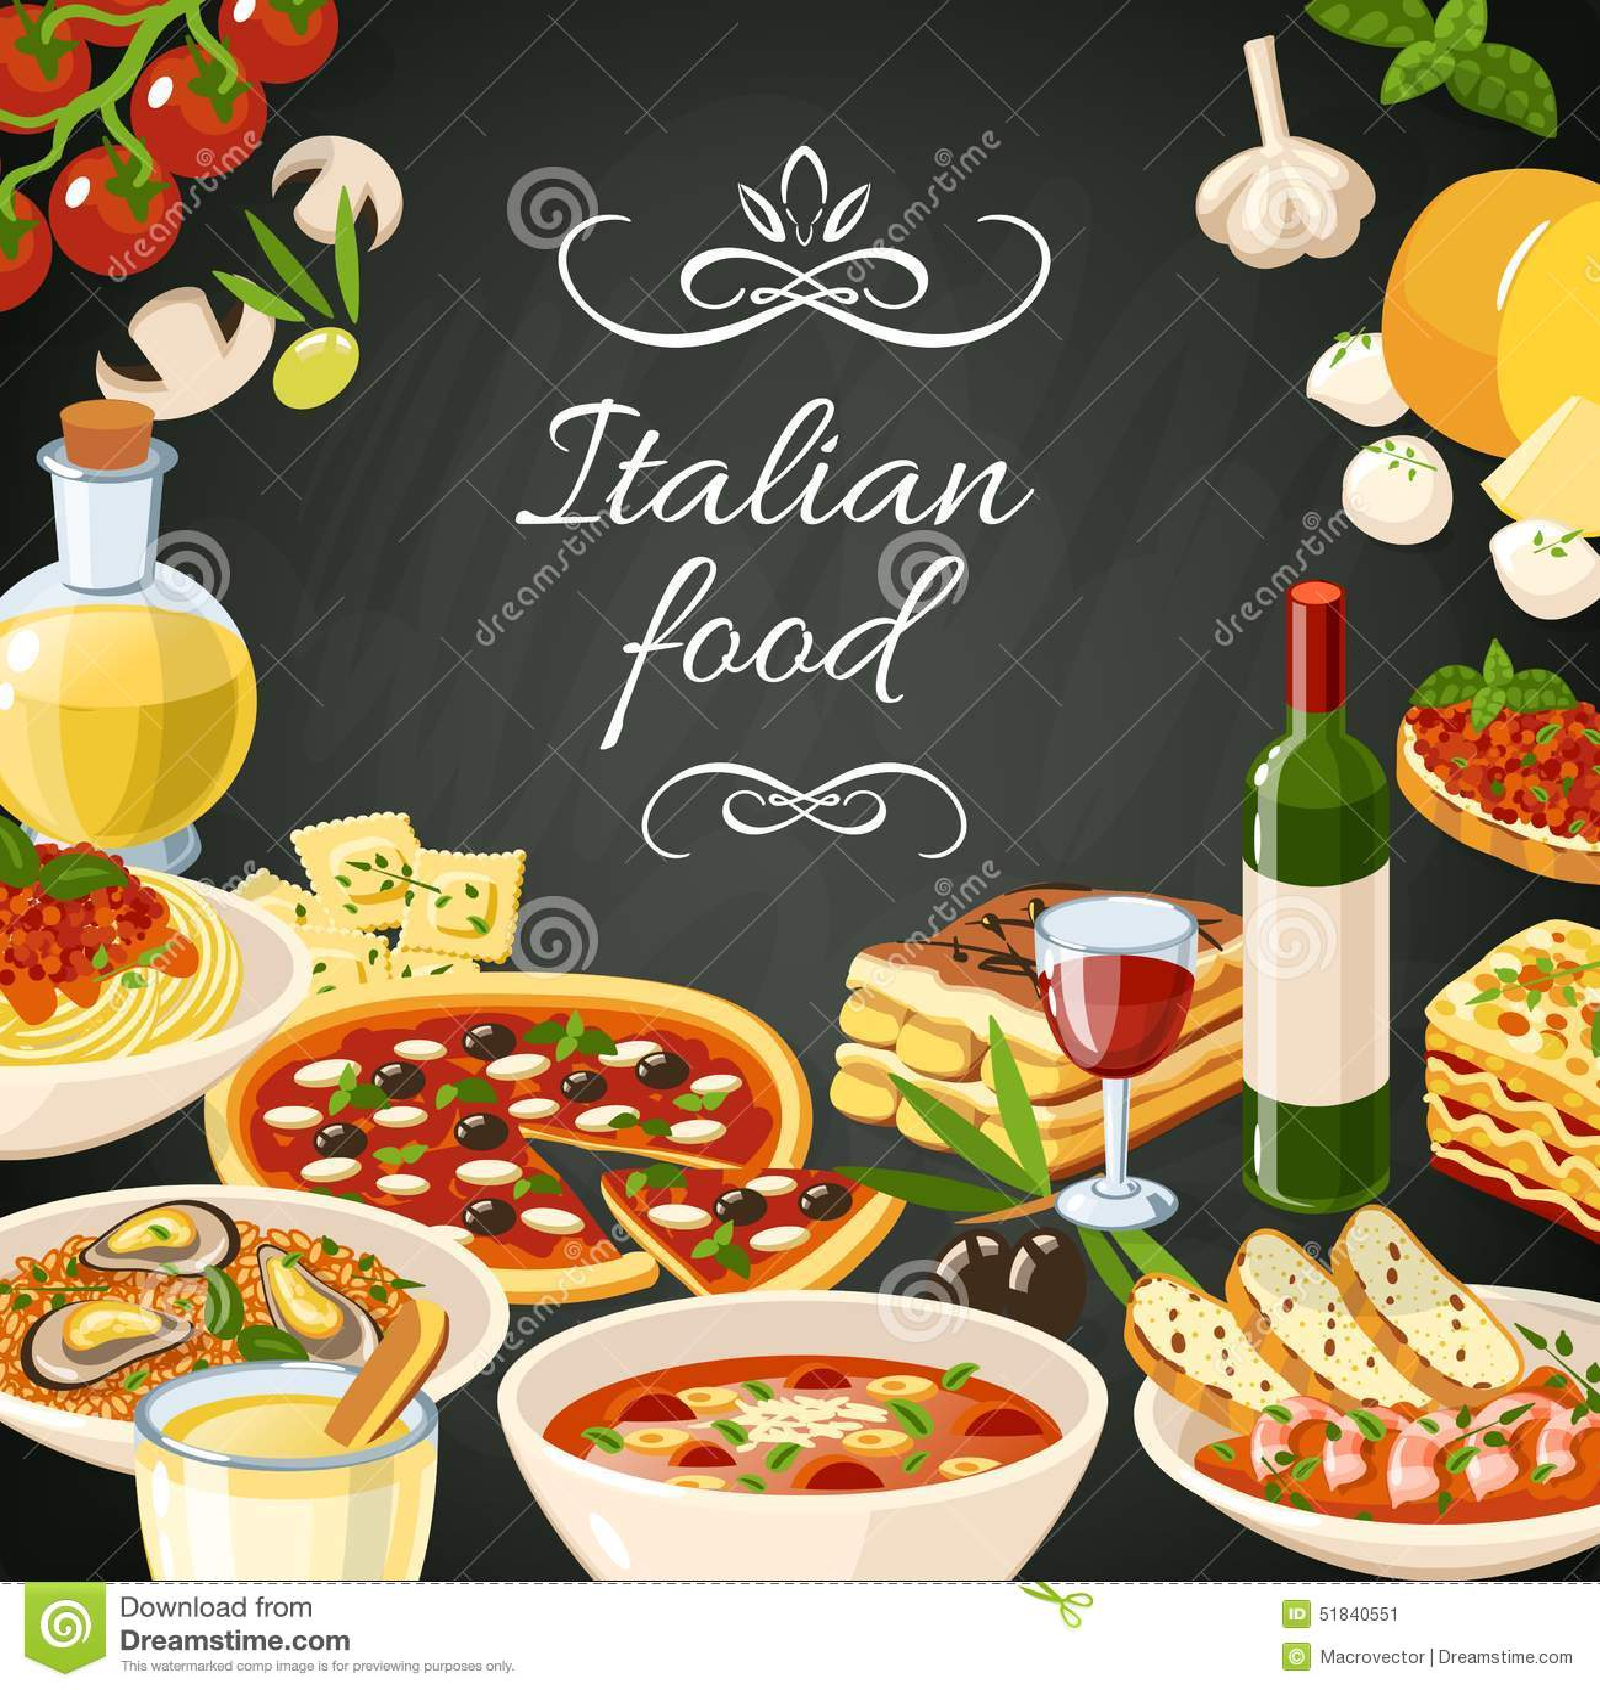 Italian Food Illustration Stock Vector Image 51840551